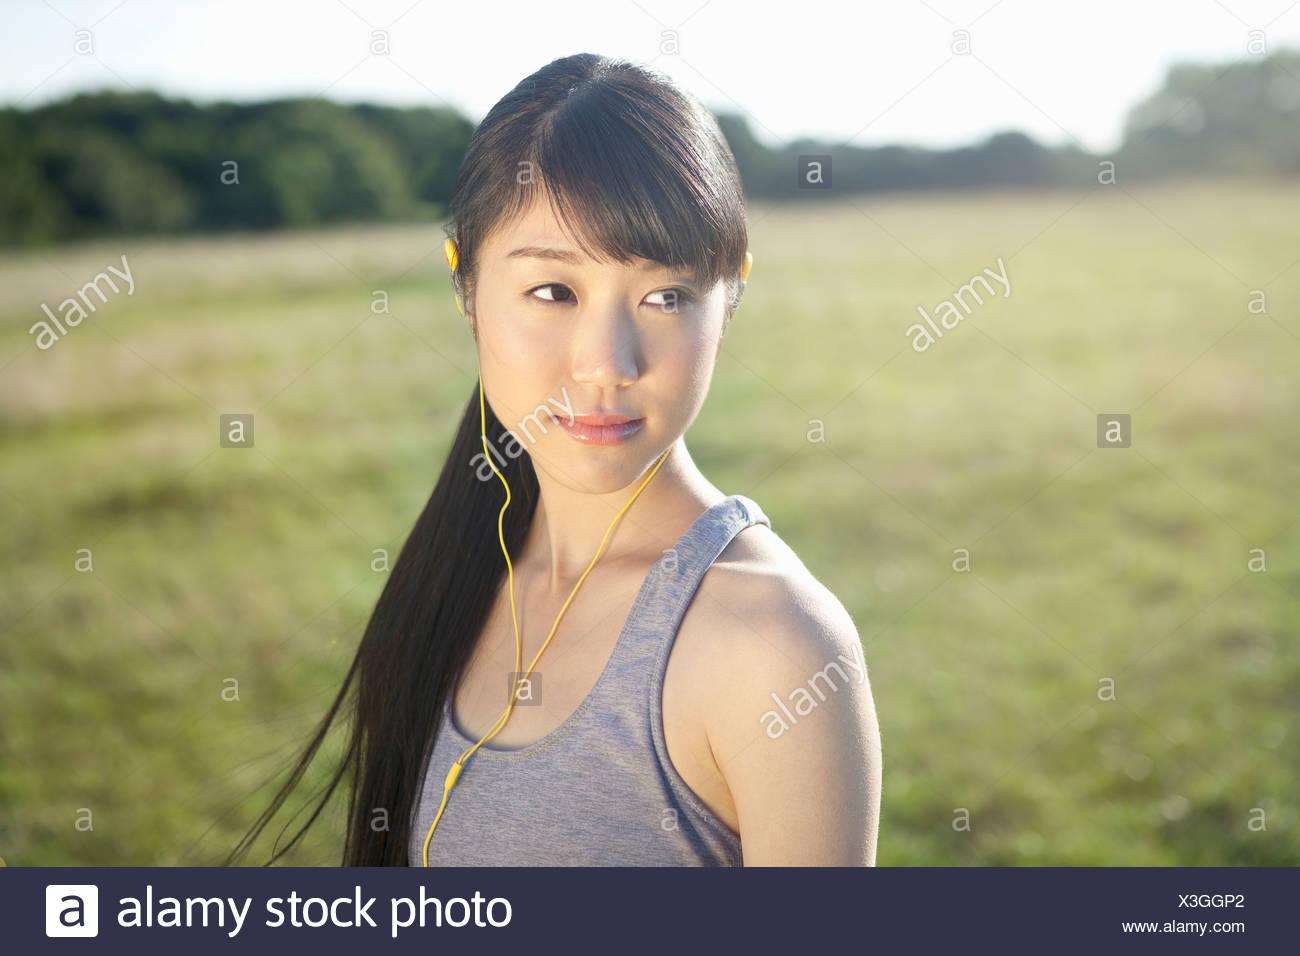 Portrait of young female runner wearing earphones Stock Photo